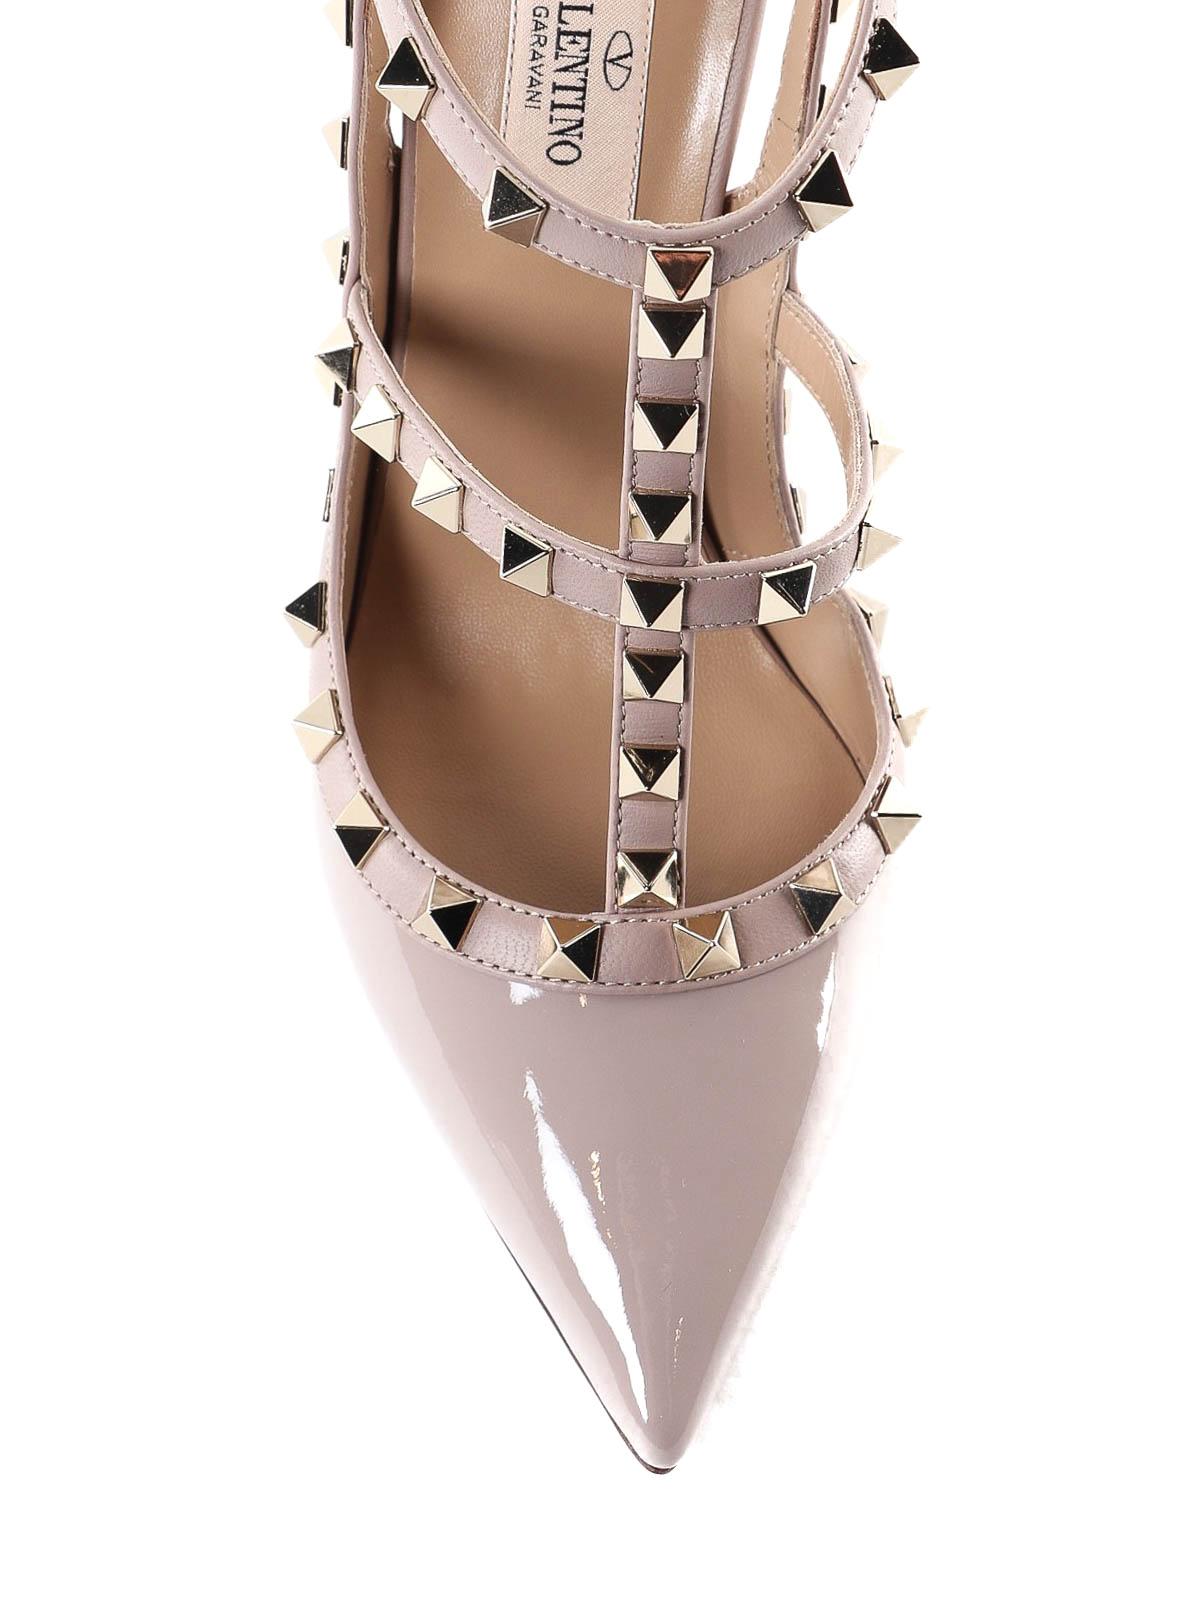 28a41fca788 iKRIX VALENTINO GARAVANI  court shoes - Rockstud patent leather slingbacks